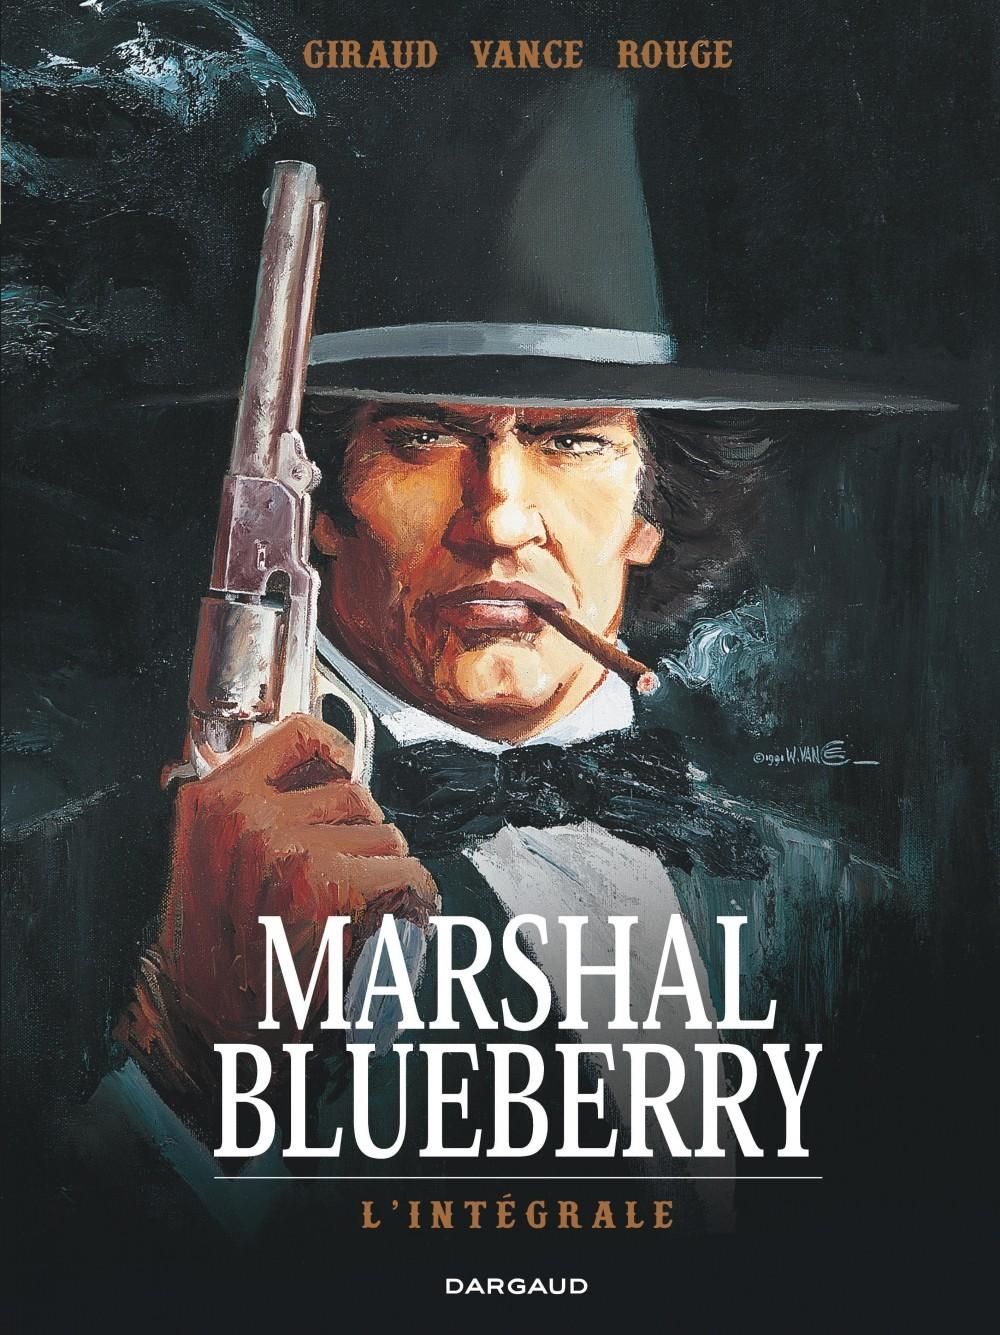 MARSHALL BLUEBERRY - MARSHAL BLUEBERRY INTEGRAL